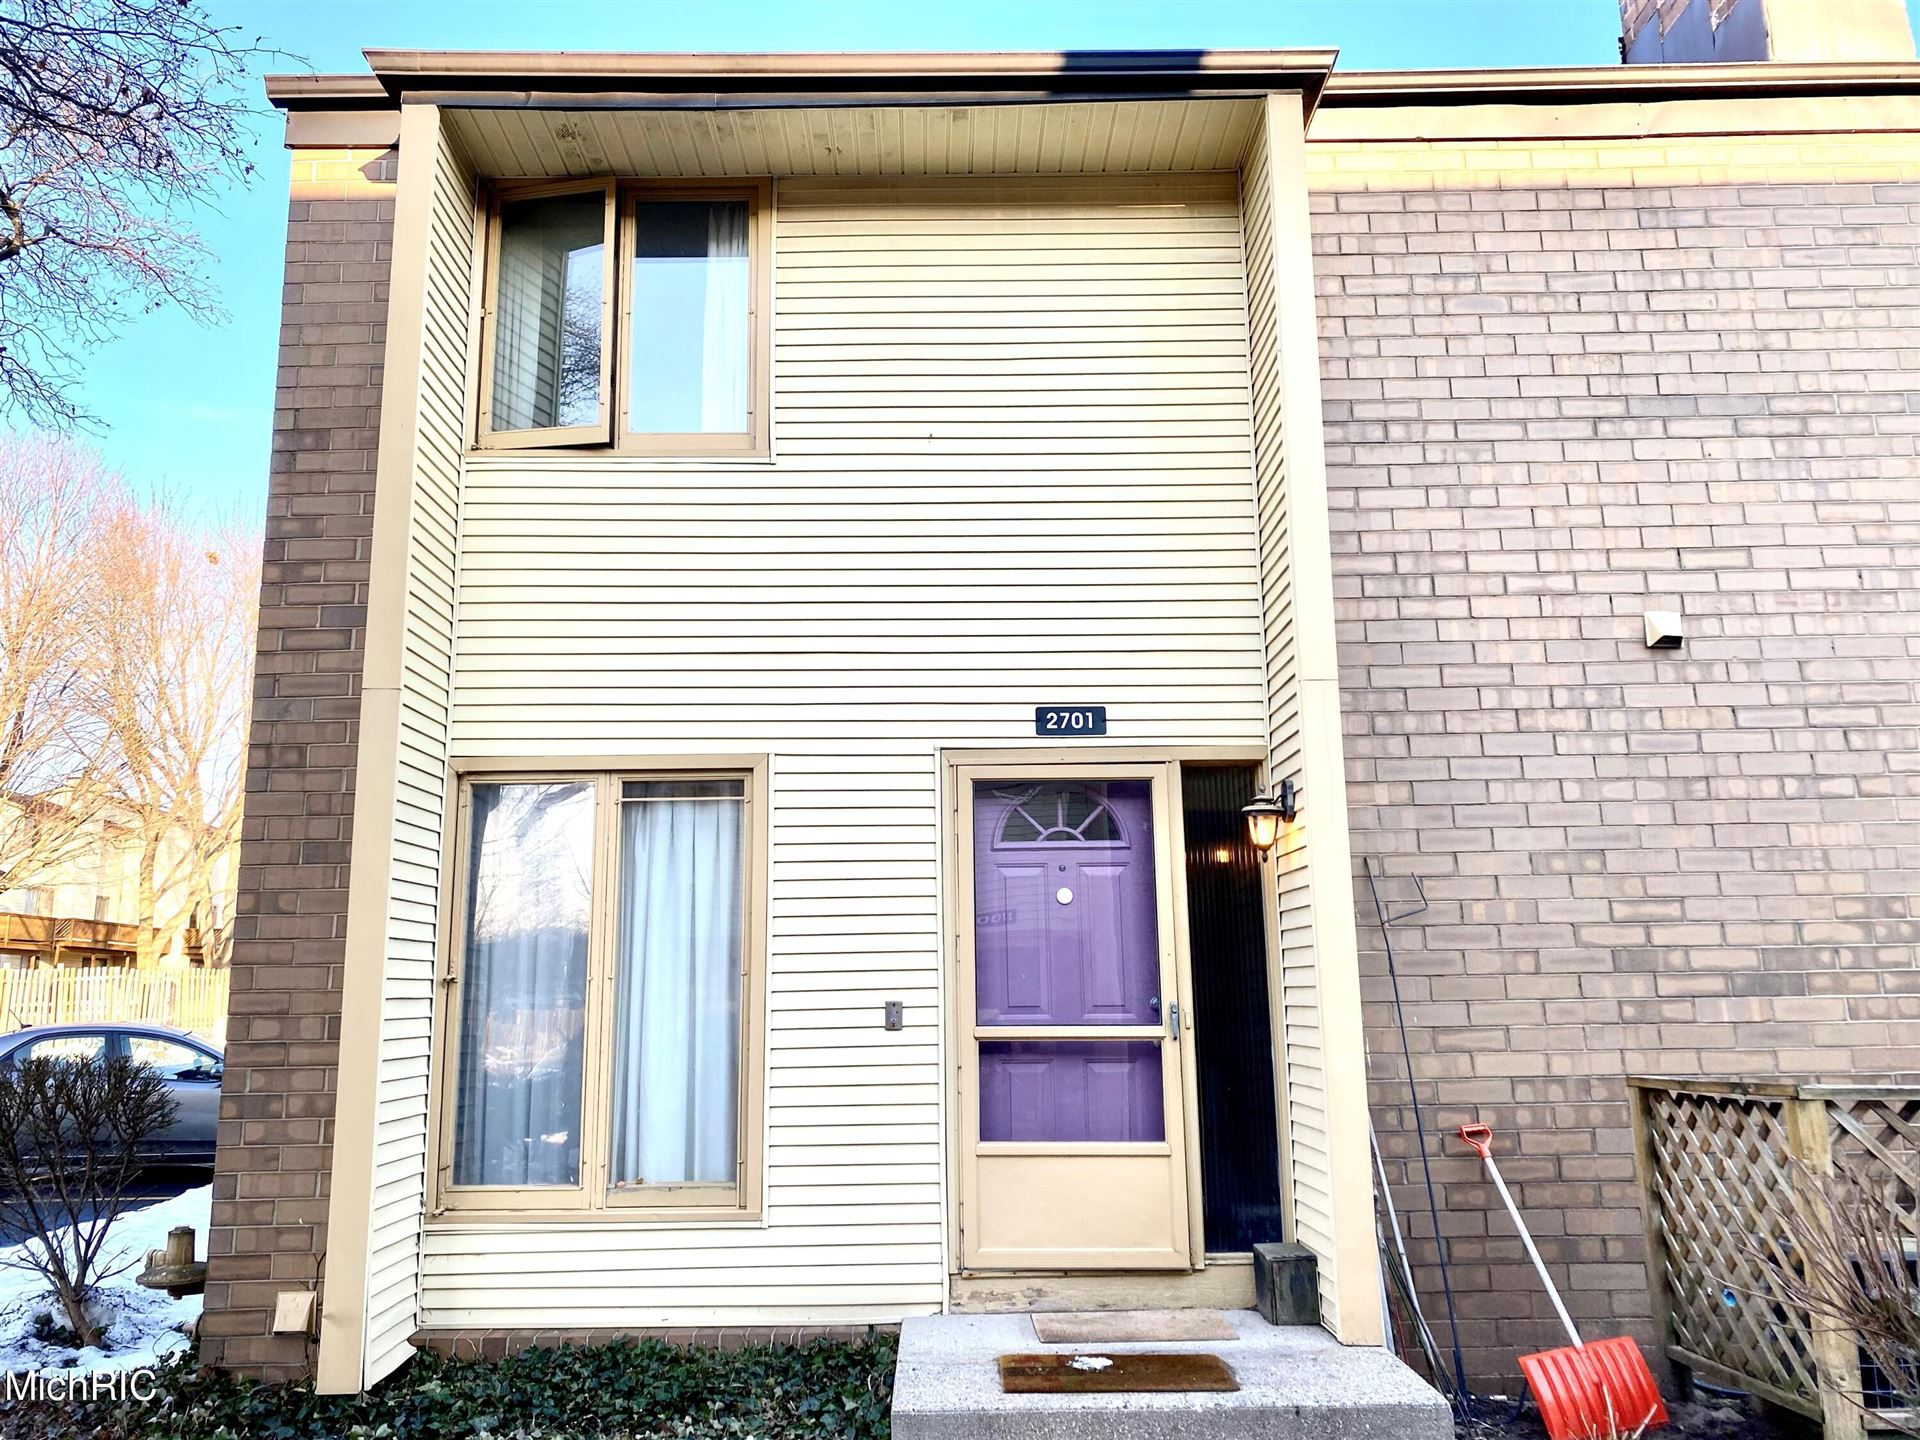 2701 Modoc Trail SE, Grand Rapids, MI 49506 - MLS#: 21007241